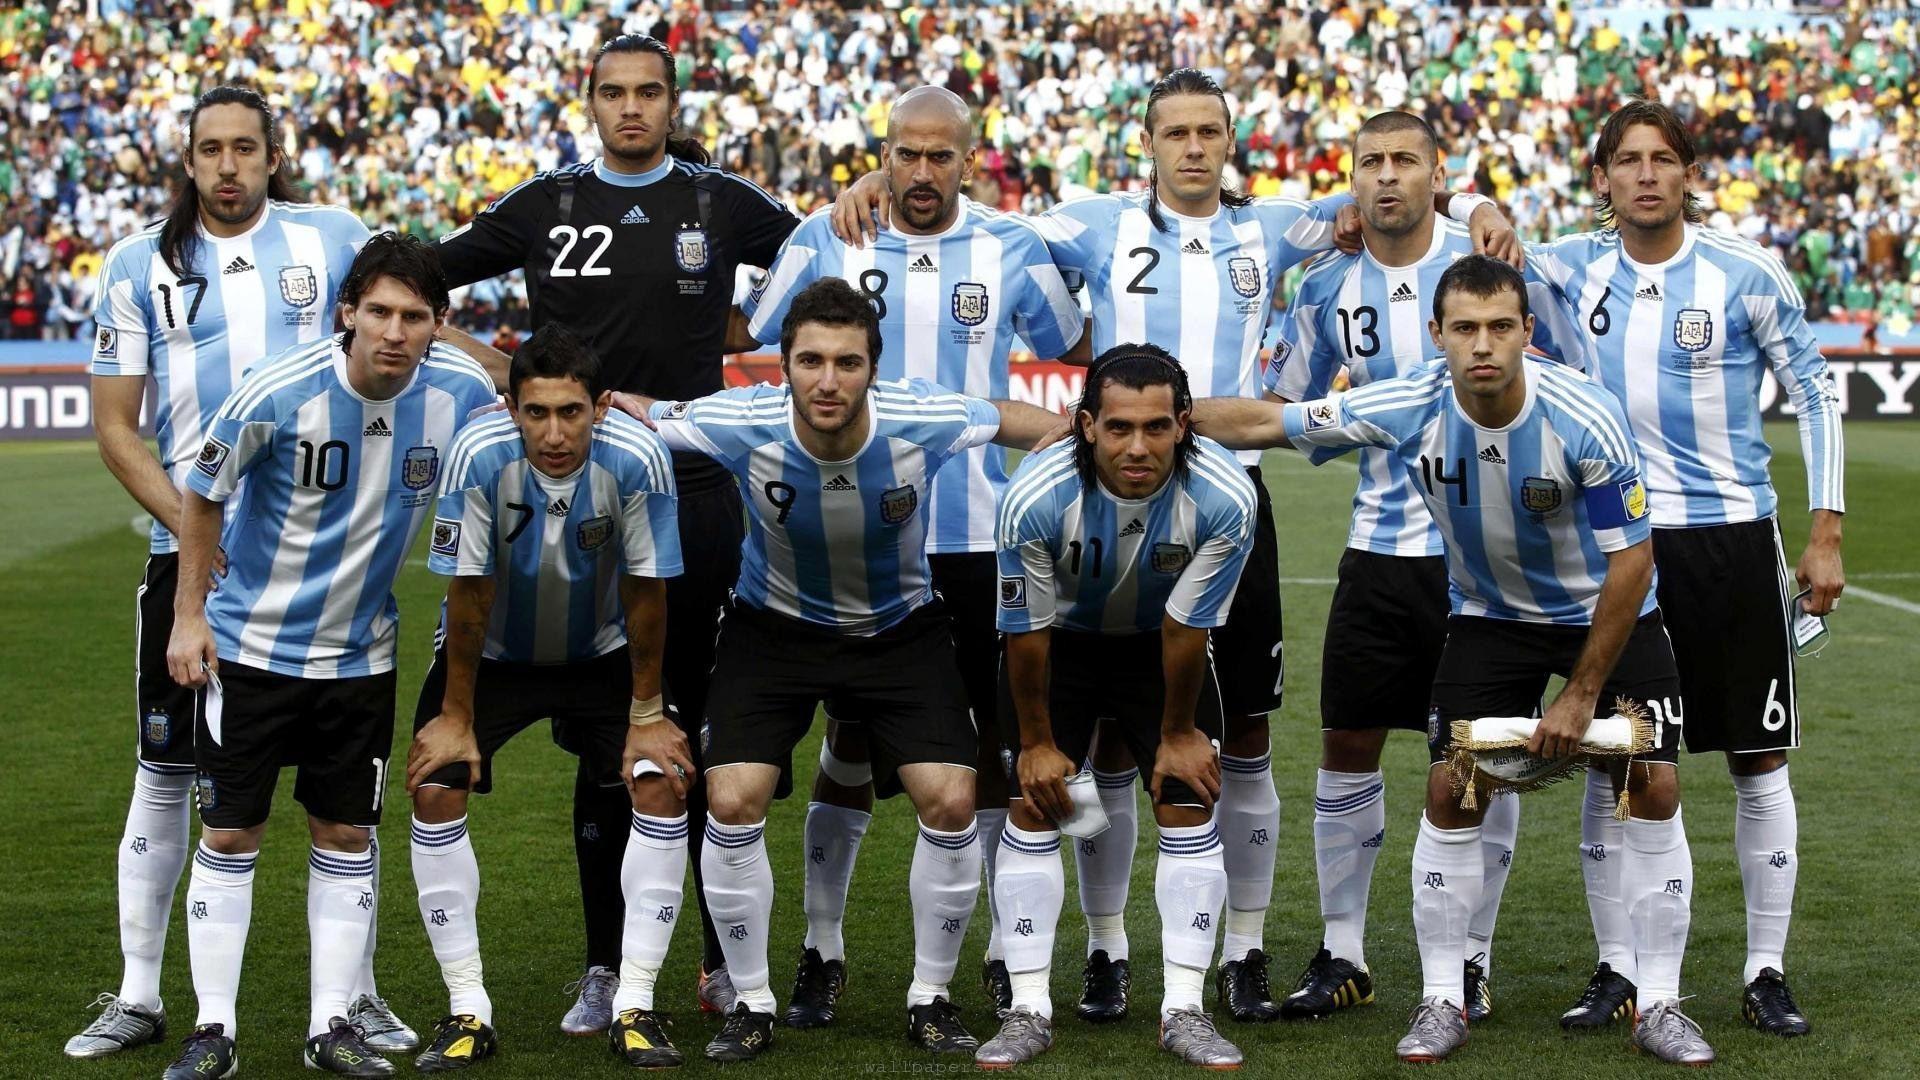 Res: 1920x1080, Argentina National Football Team #1